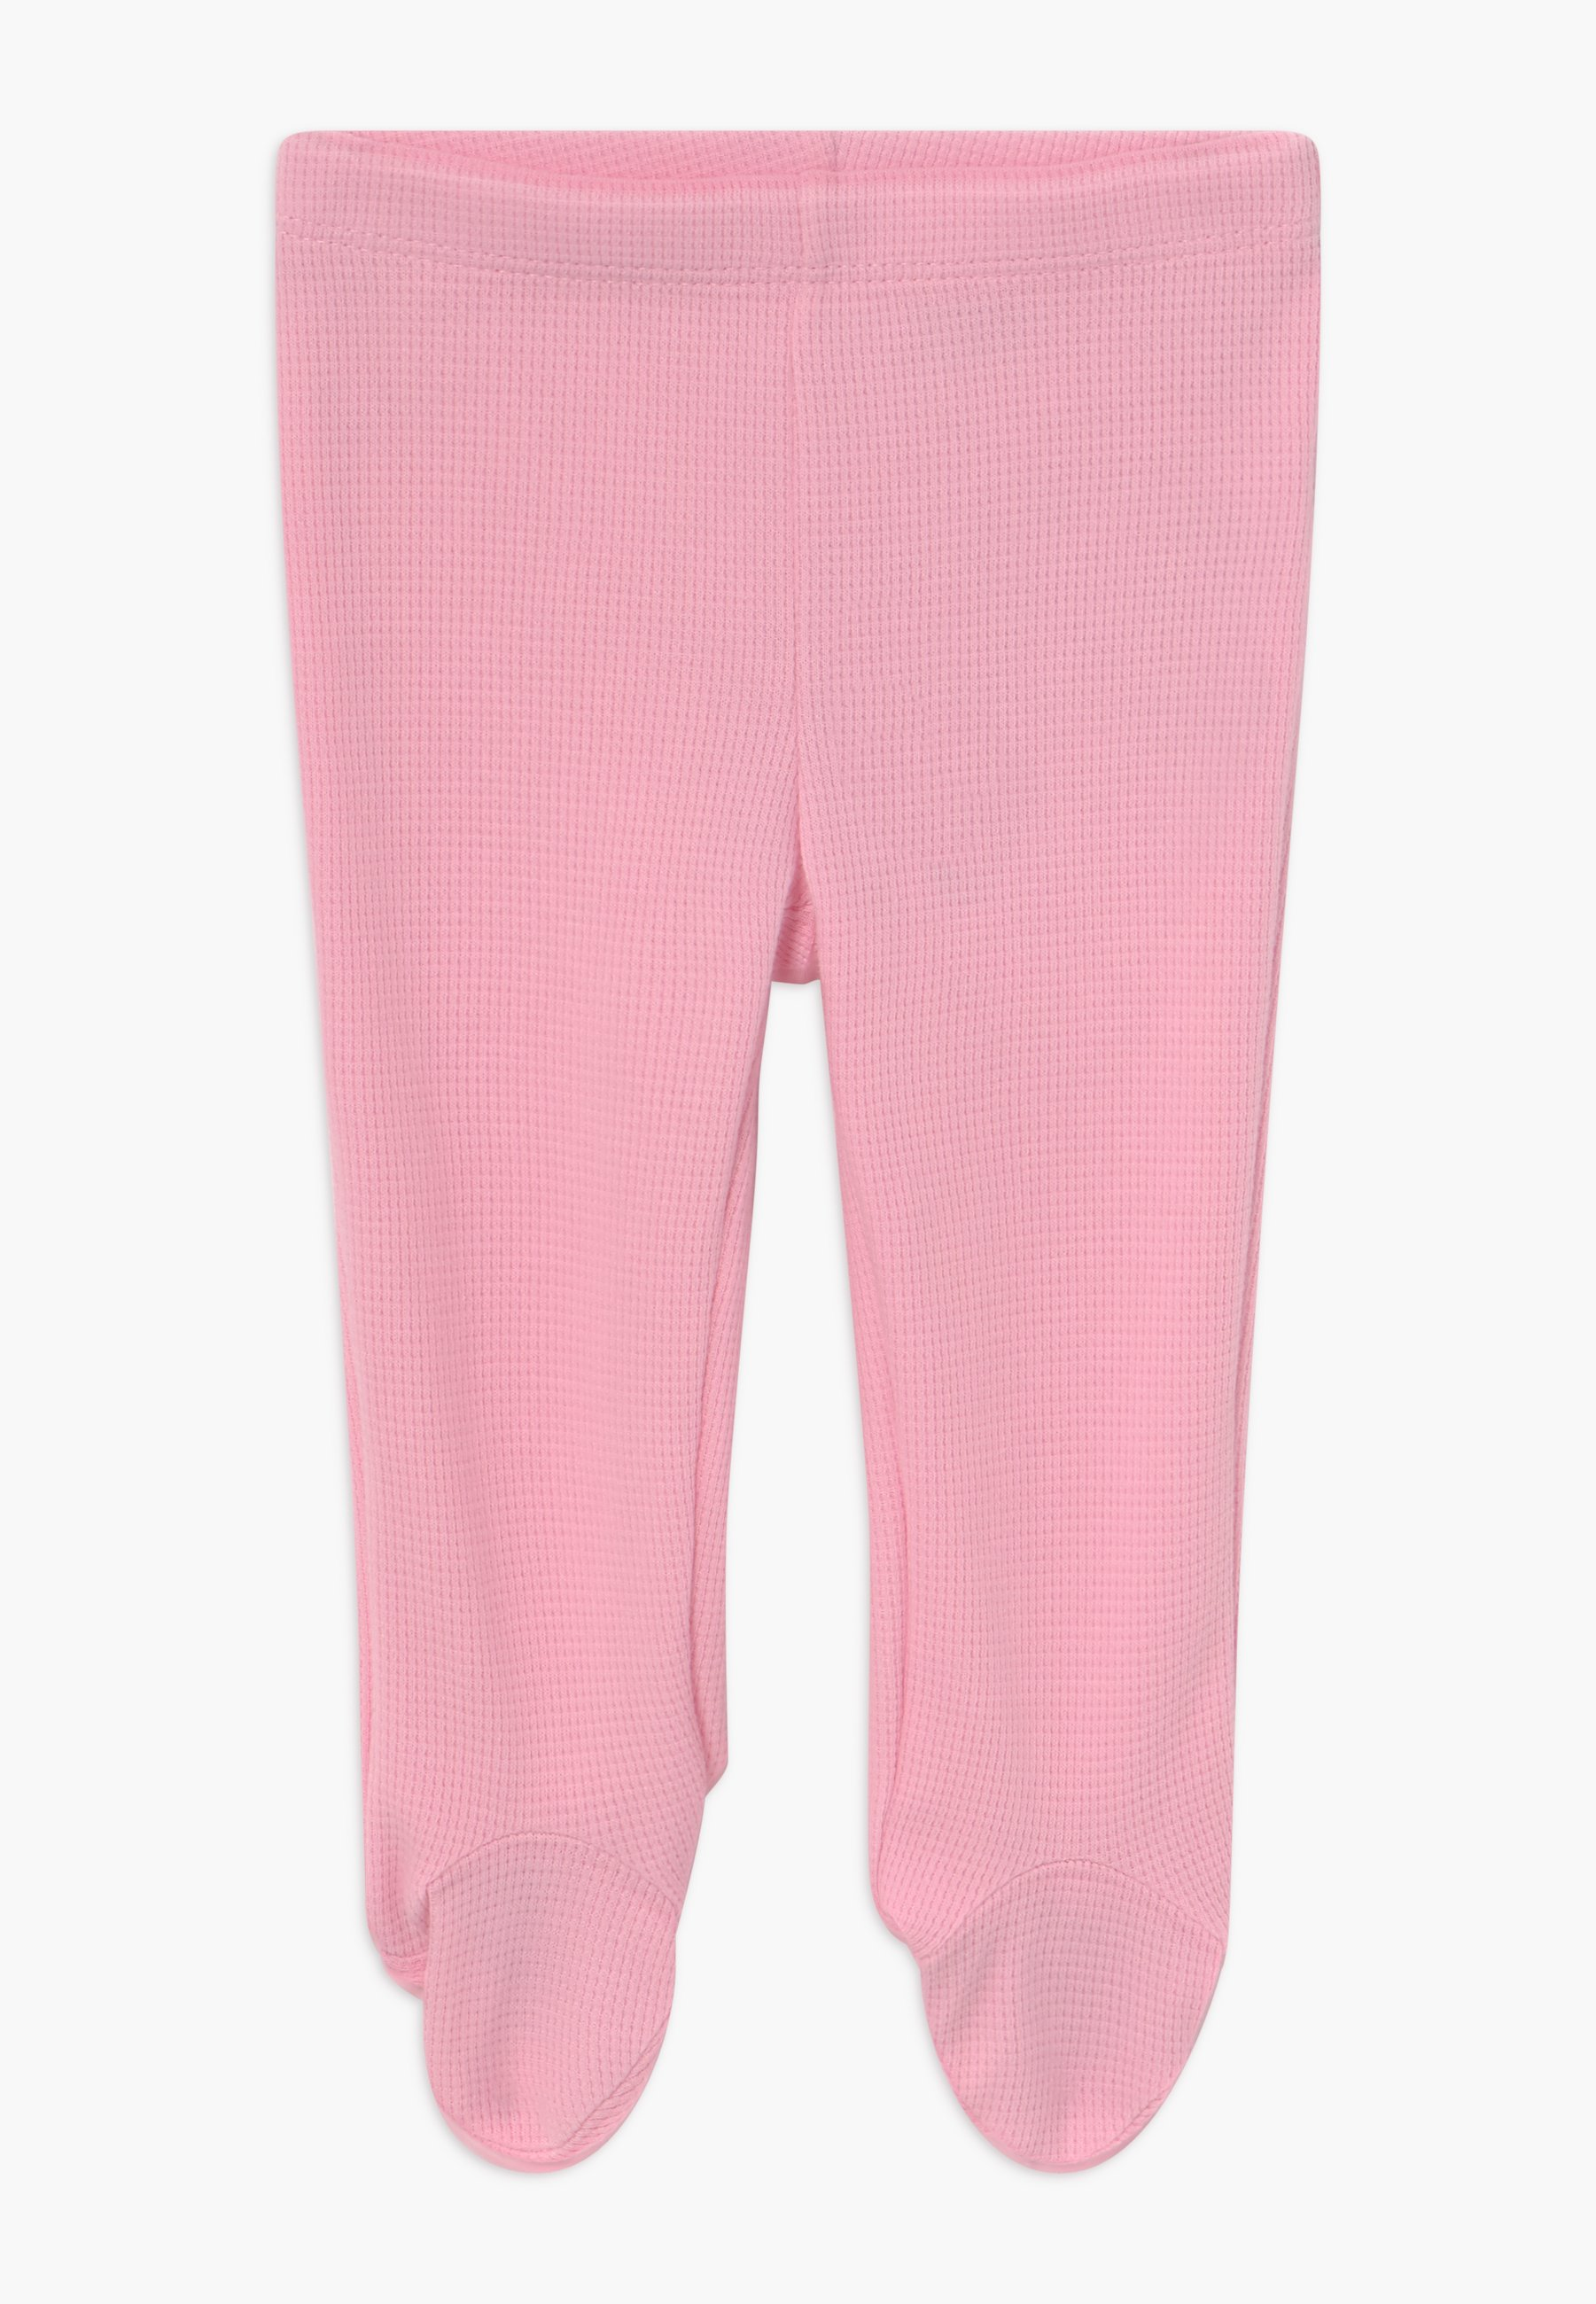 Nike Sportswear NIKE SET - Lue - pink/lyserosa 1XbhqPY7B5OwRxa